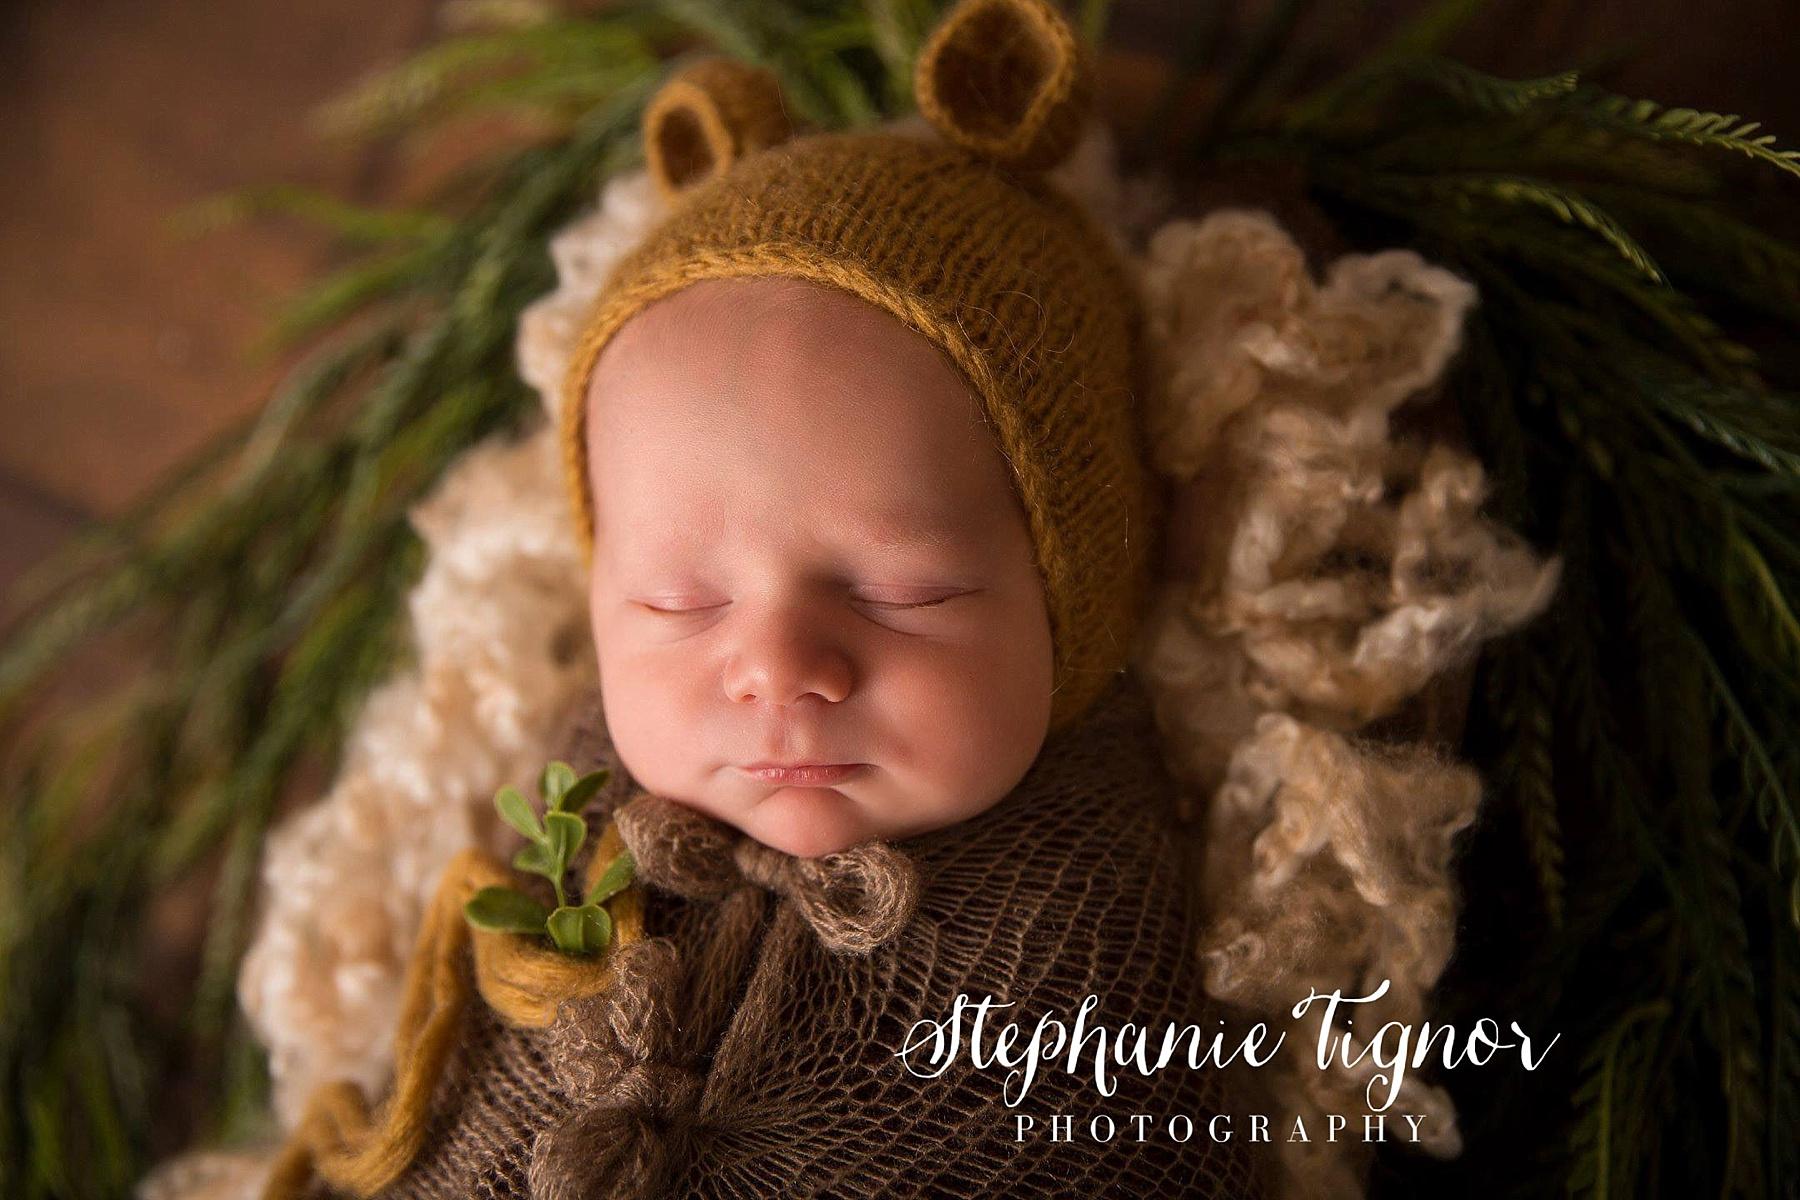 Stephanie Tignor Photography | Fredericksburg VA Newborn Photographer | Warrenton VA Newborn Photographer | Stafford VA Newborn Photographer | Newborn Photographer, spring inspired newborn portraits, spring portraits, baby portraits